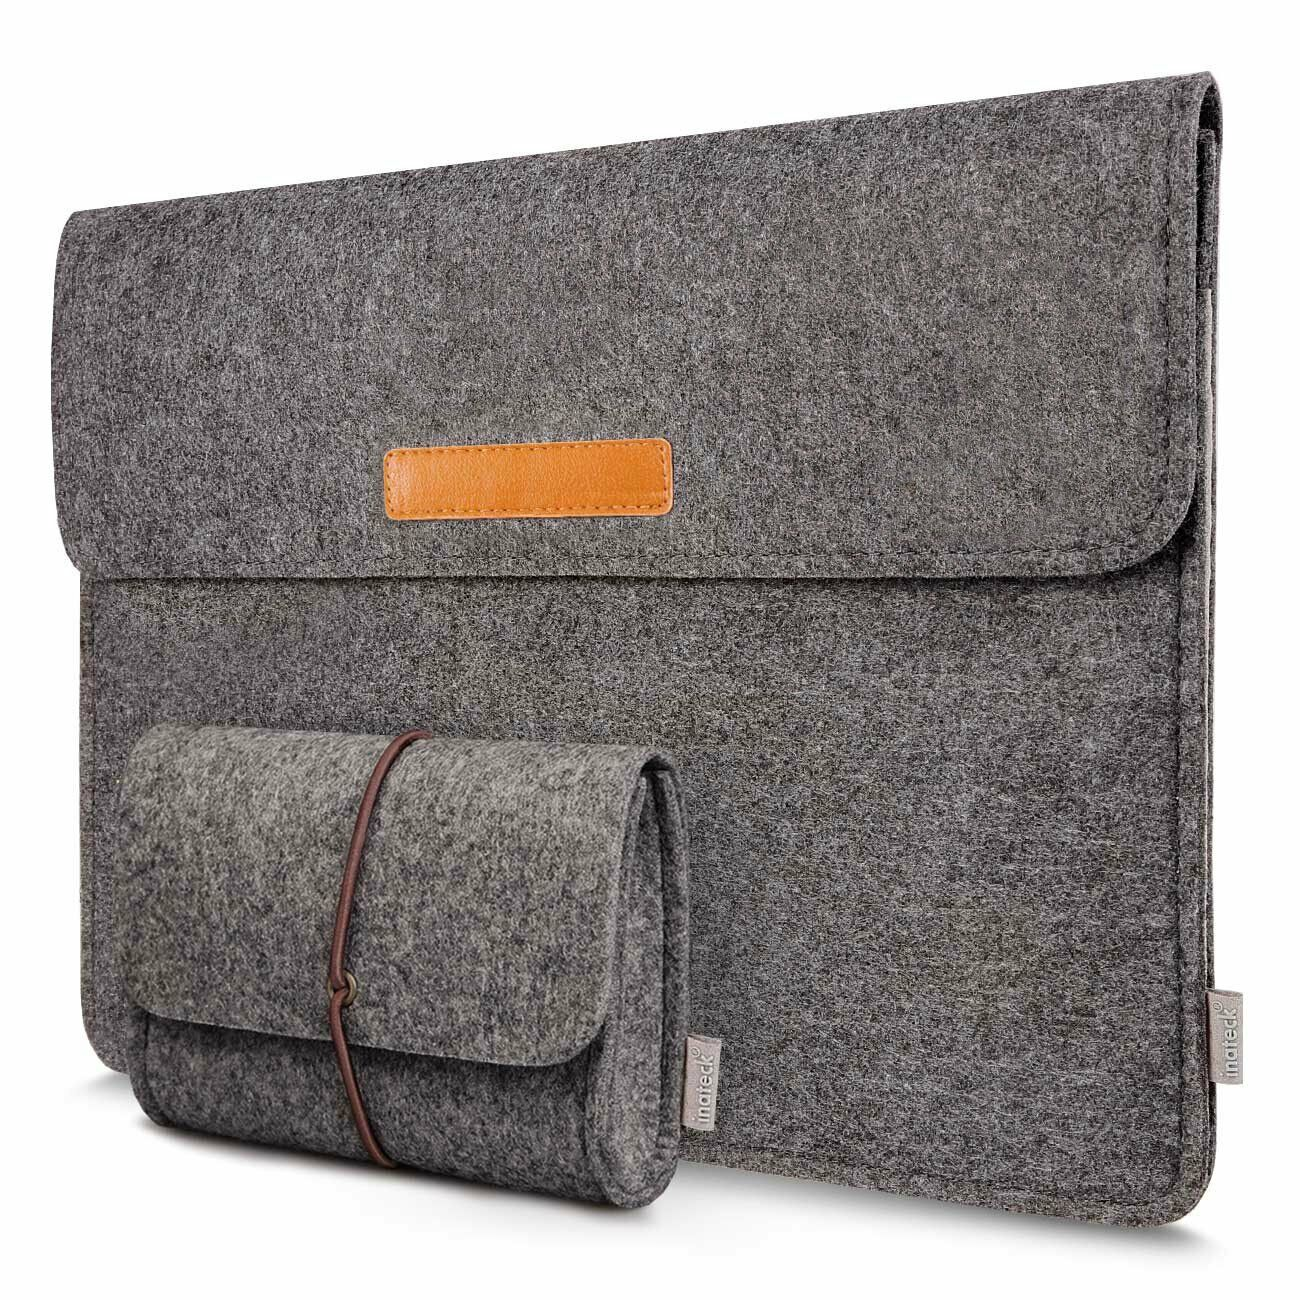 Inateck 13,3 Zoll Laptop-Tasche Filz Sleeve Hülle Kompatibel mit MacBook Air